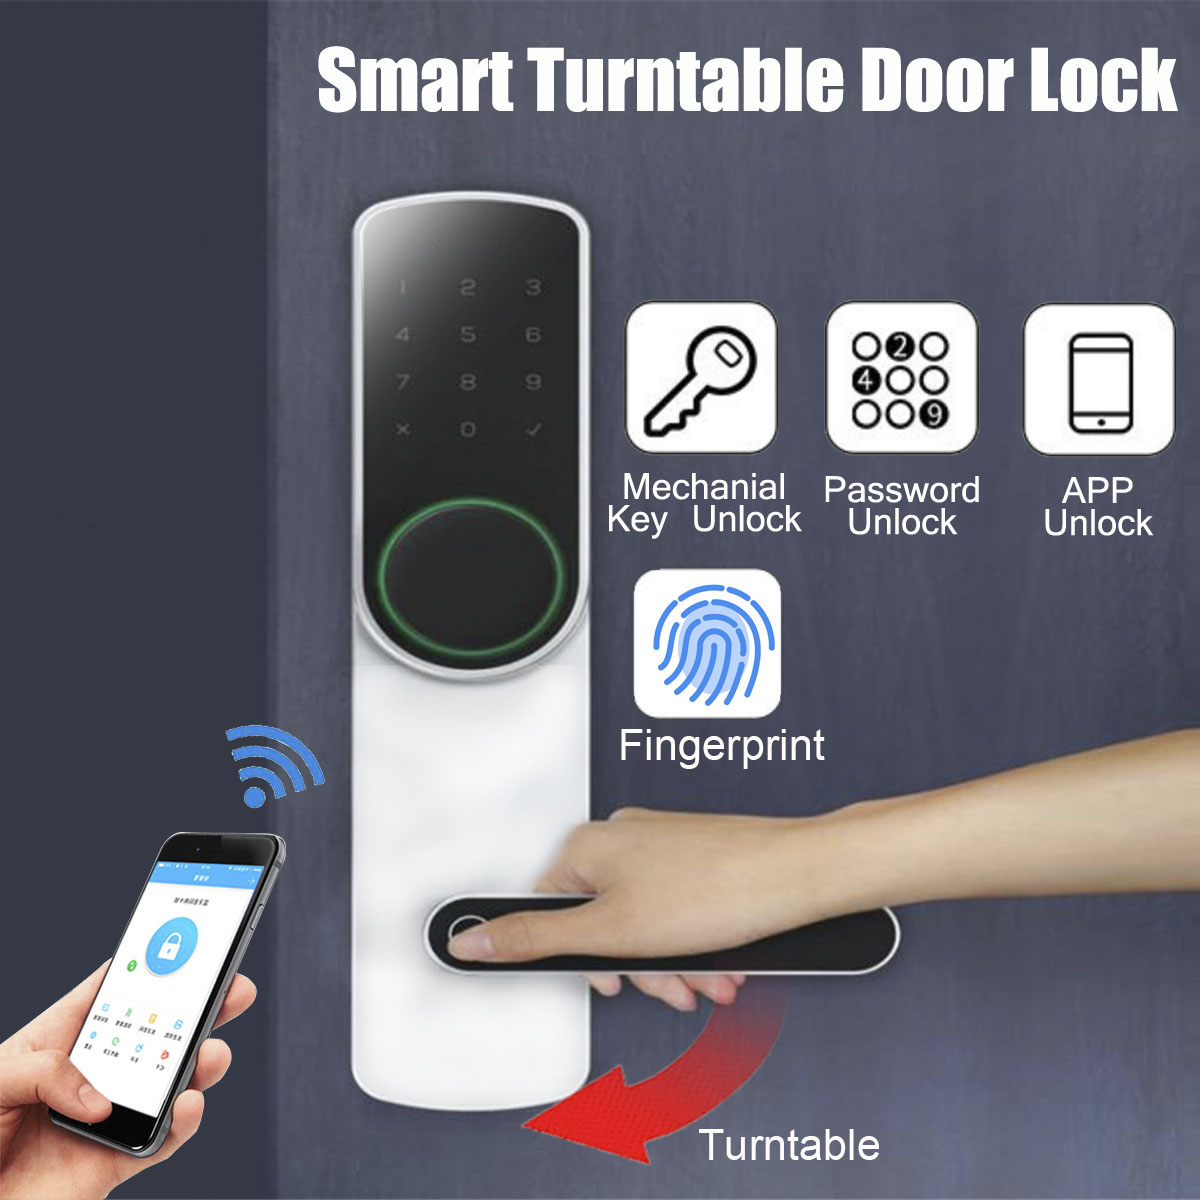 Find The Best Offer Smart Turntable Door Lock Fingerprint Password Intelligent Electronic Keyless Security Wifi Bluetooth